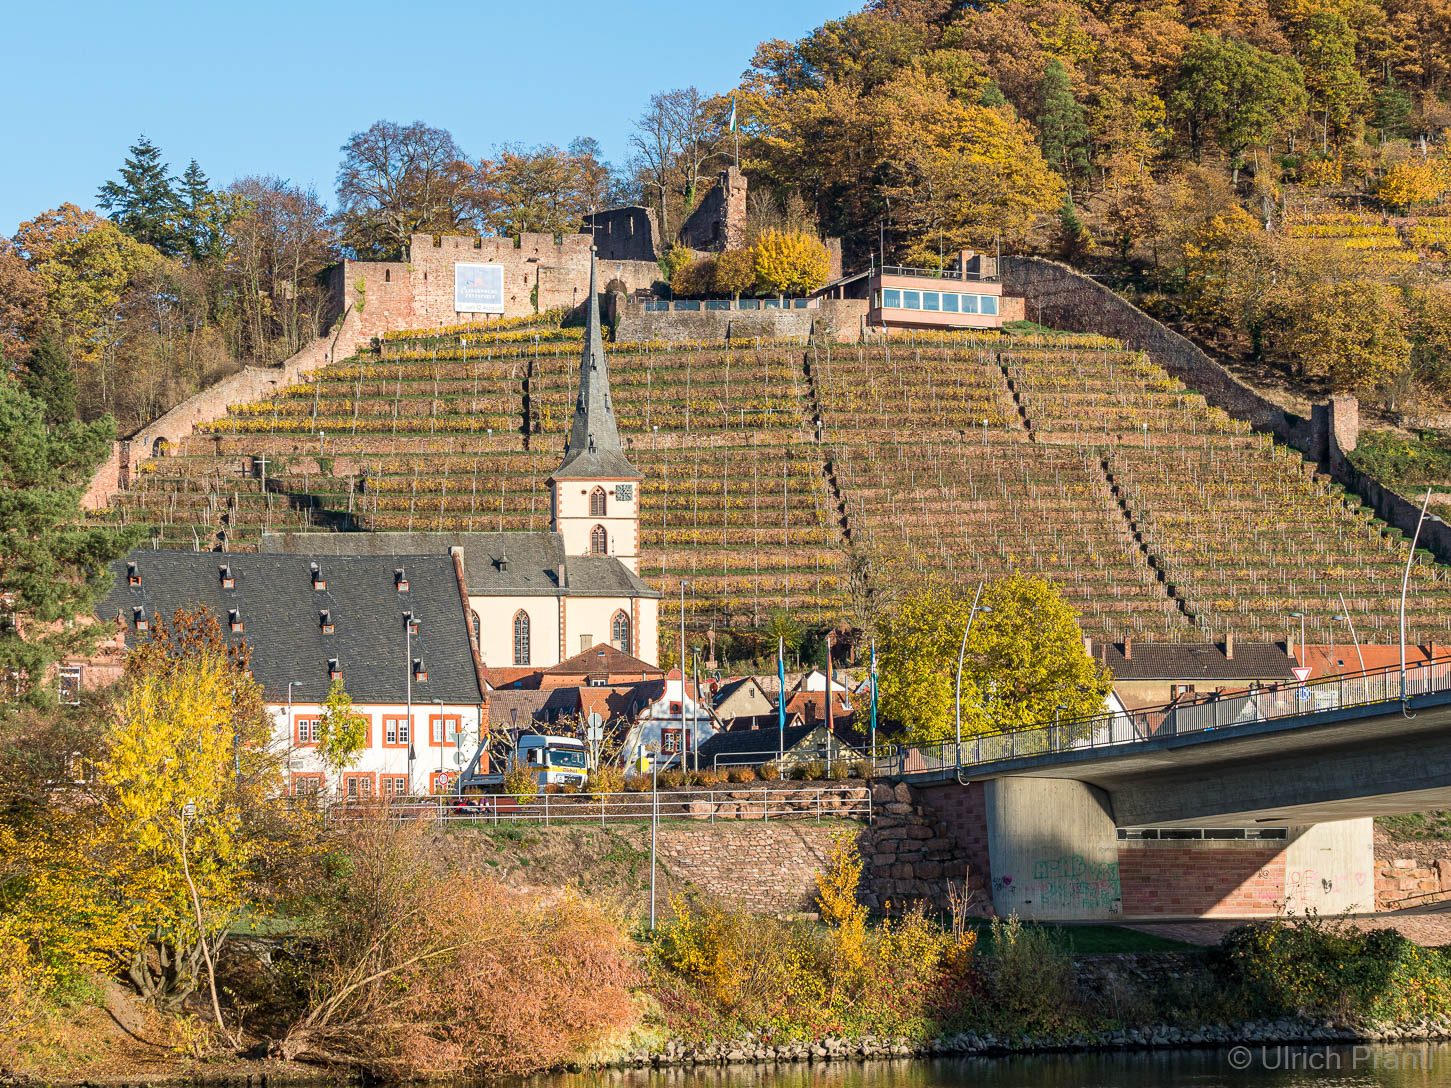 Klingenberg Clingenburg